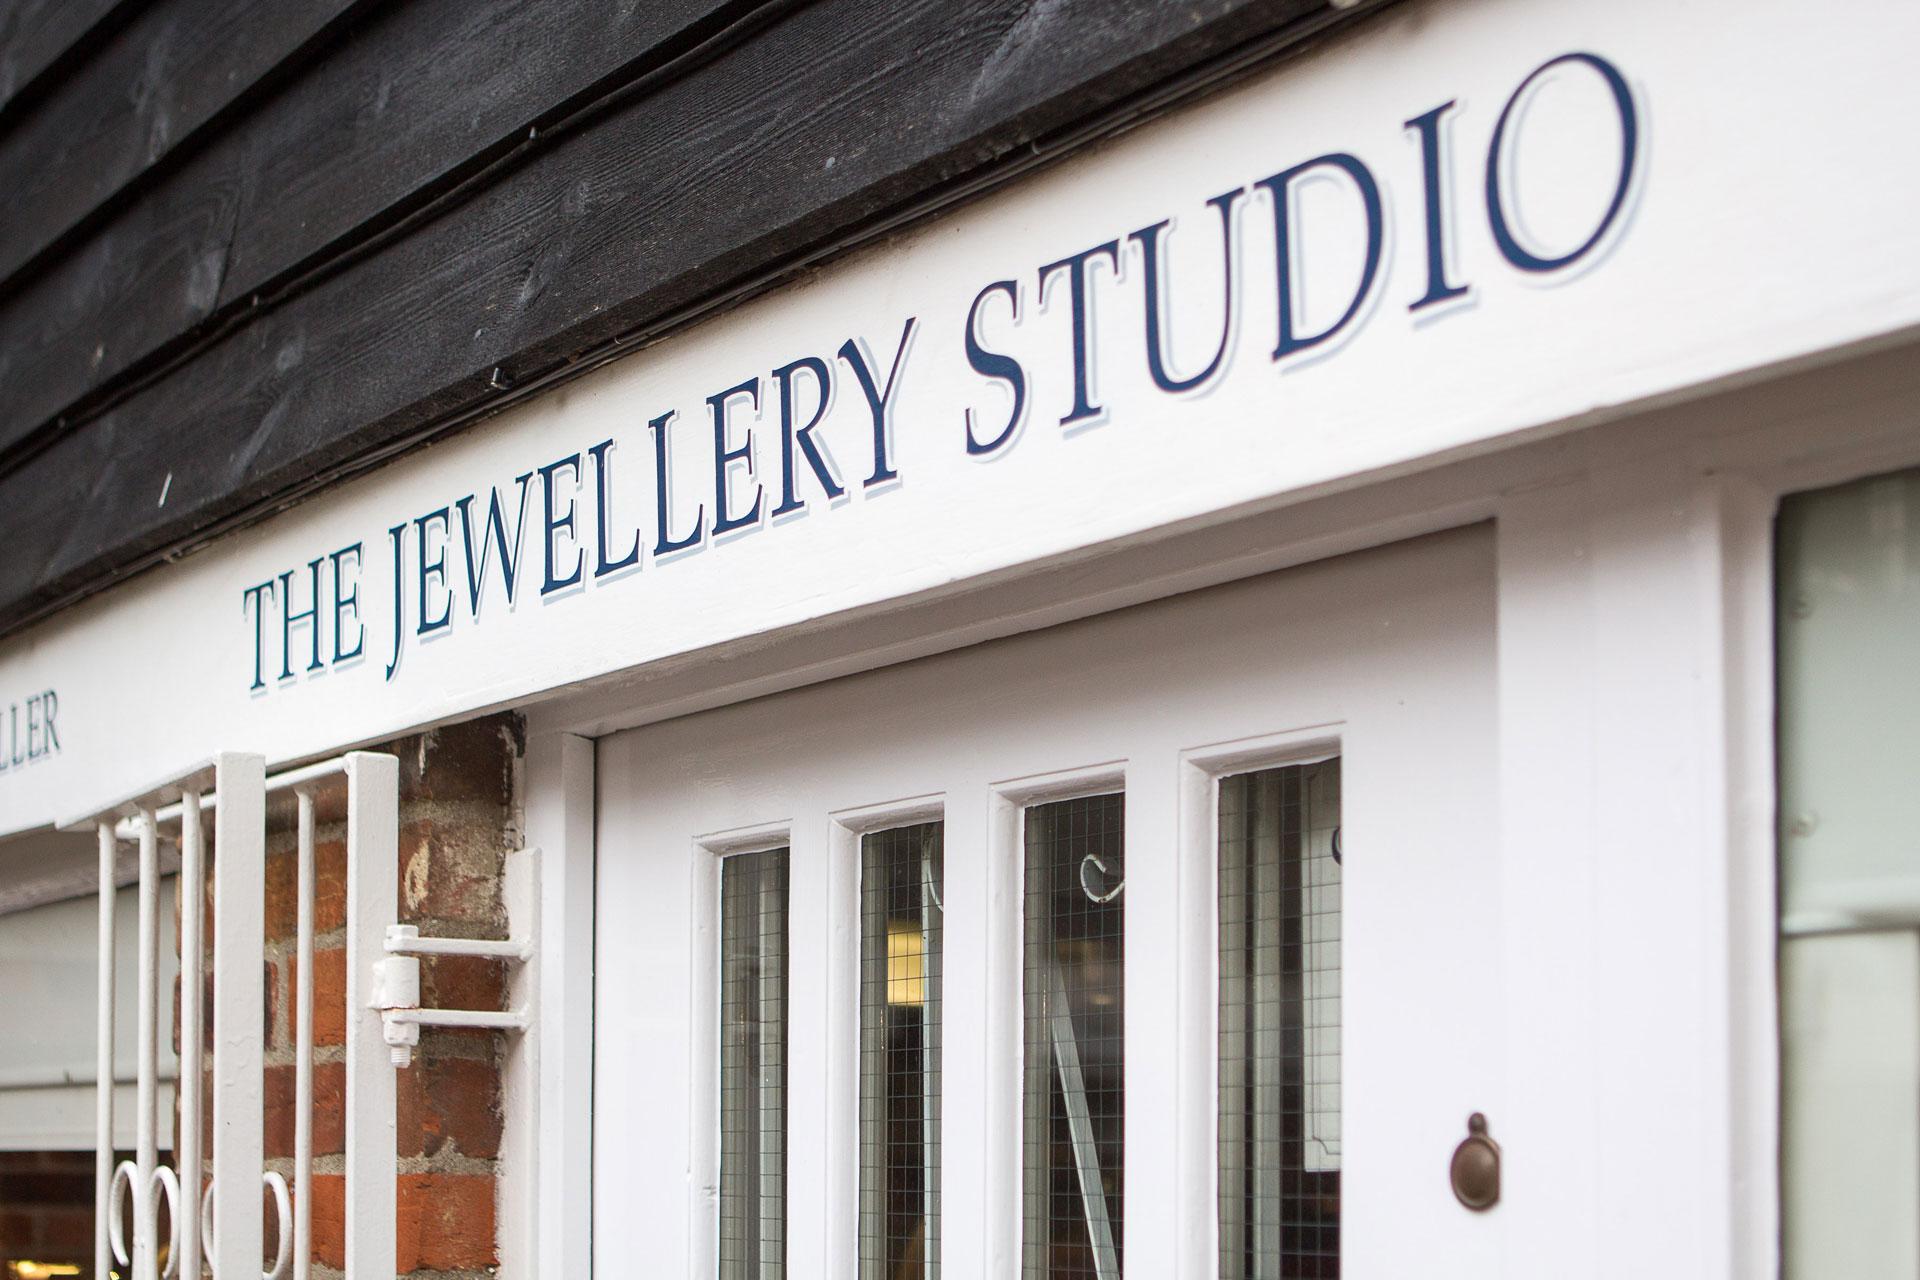 The Jewellery Studio